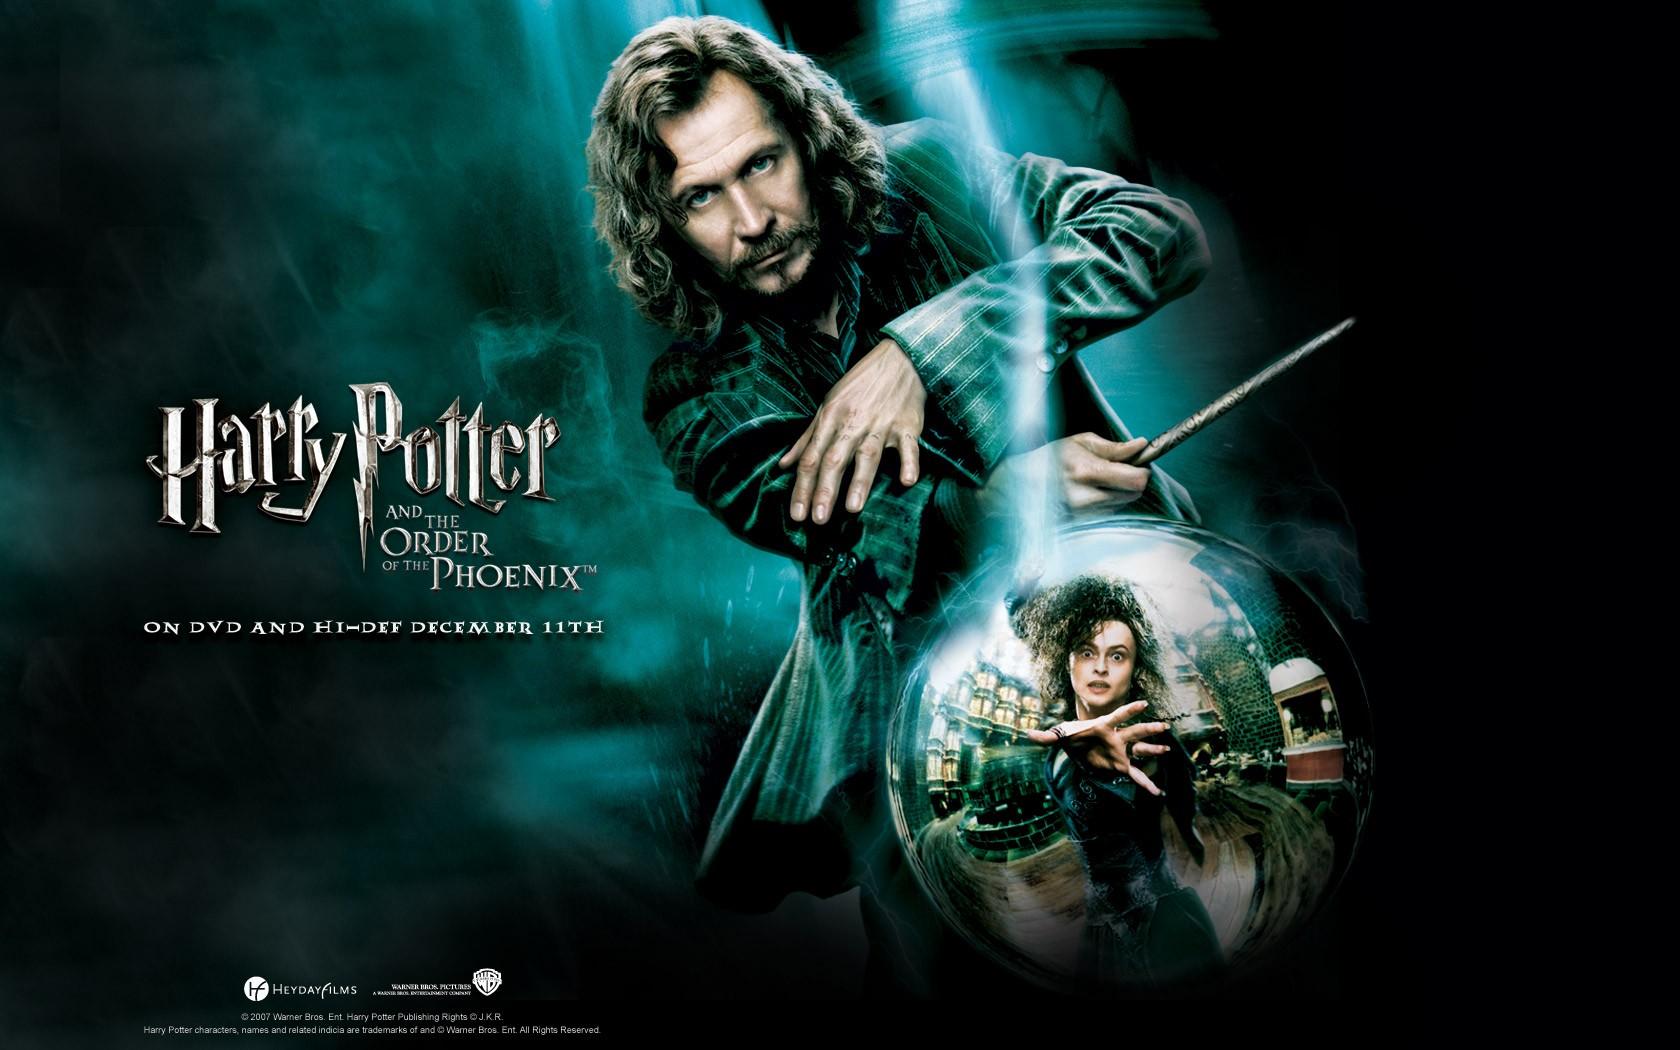 Un wallpaper ufficiale per Harry Potter and the Order of the Phoenix con Gary Oldman